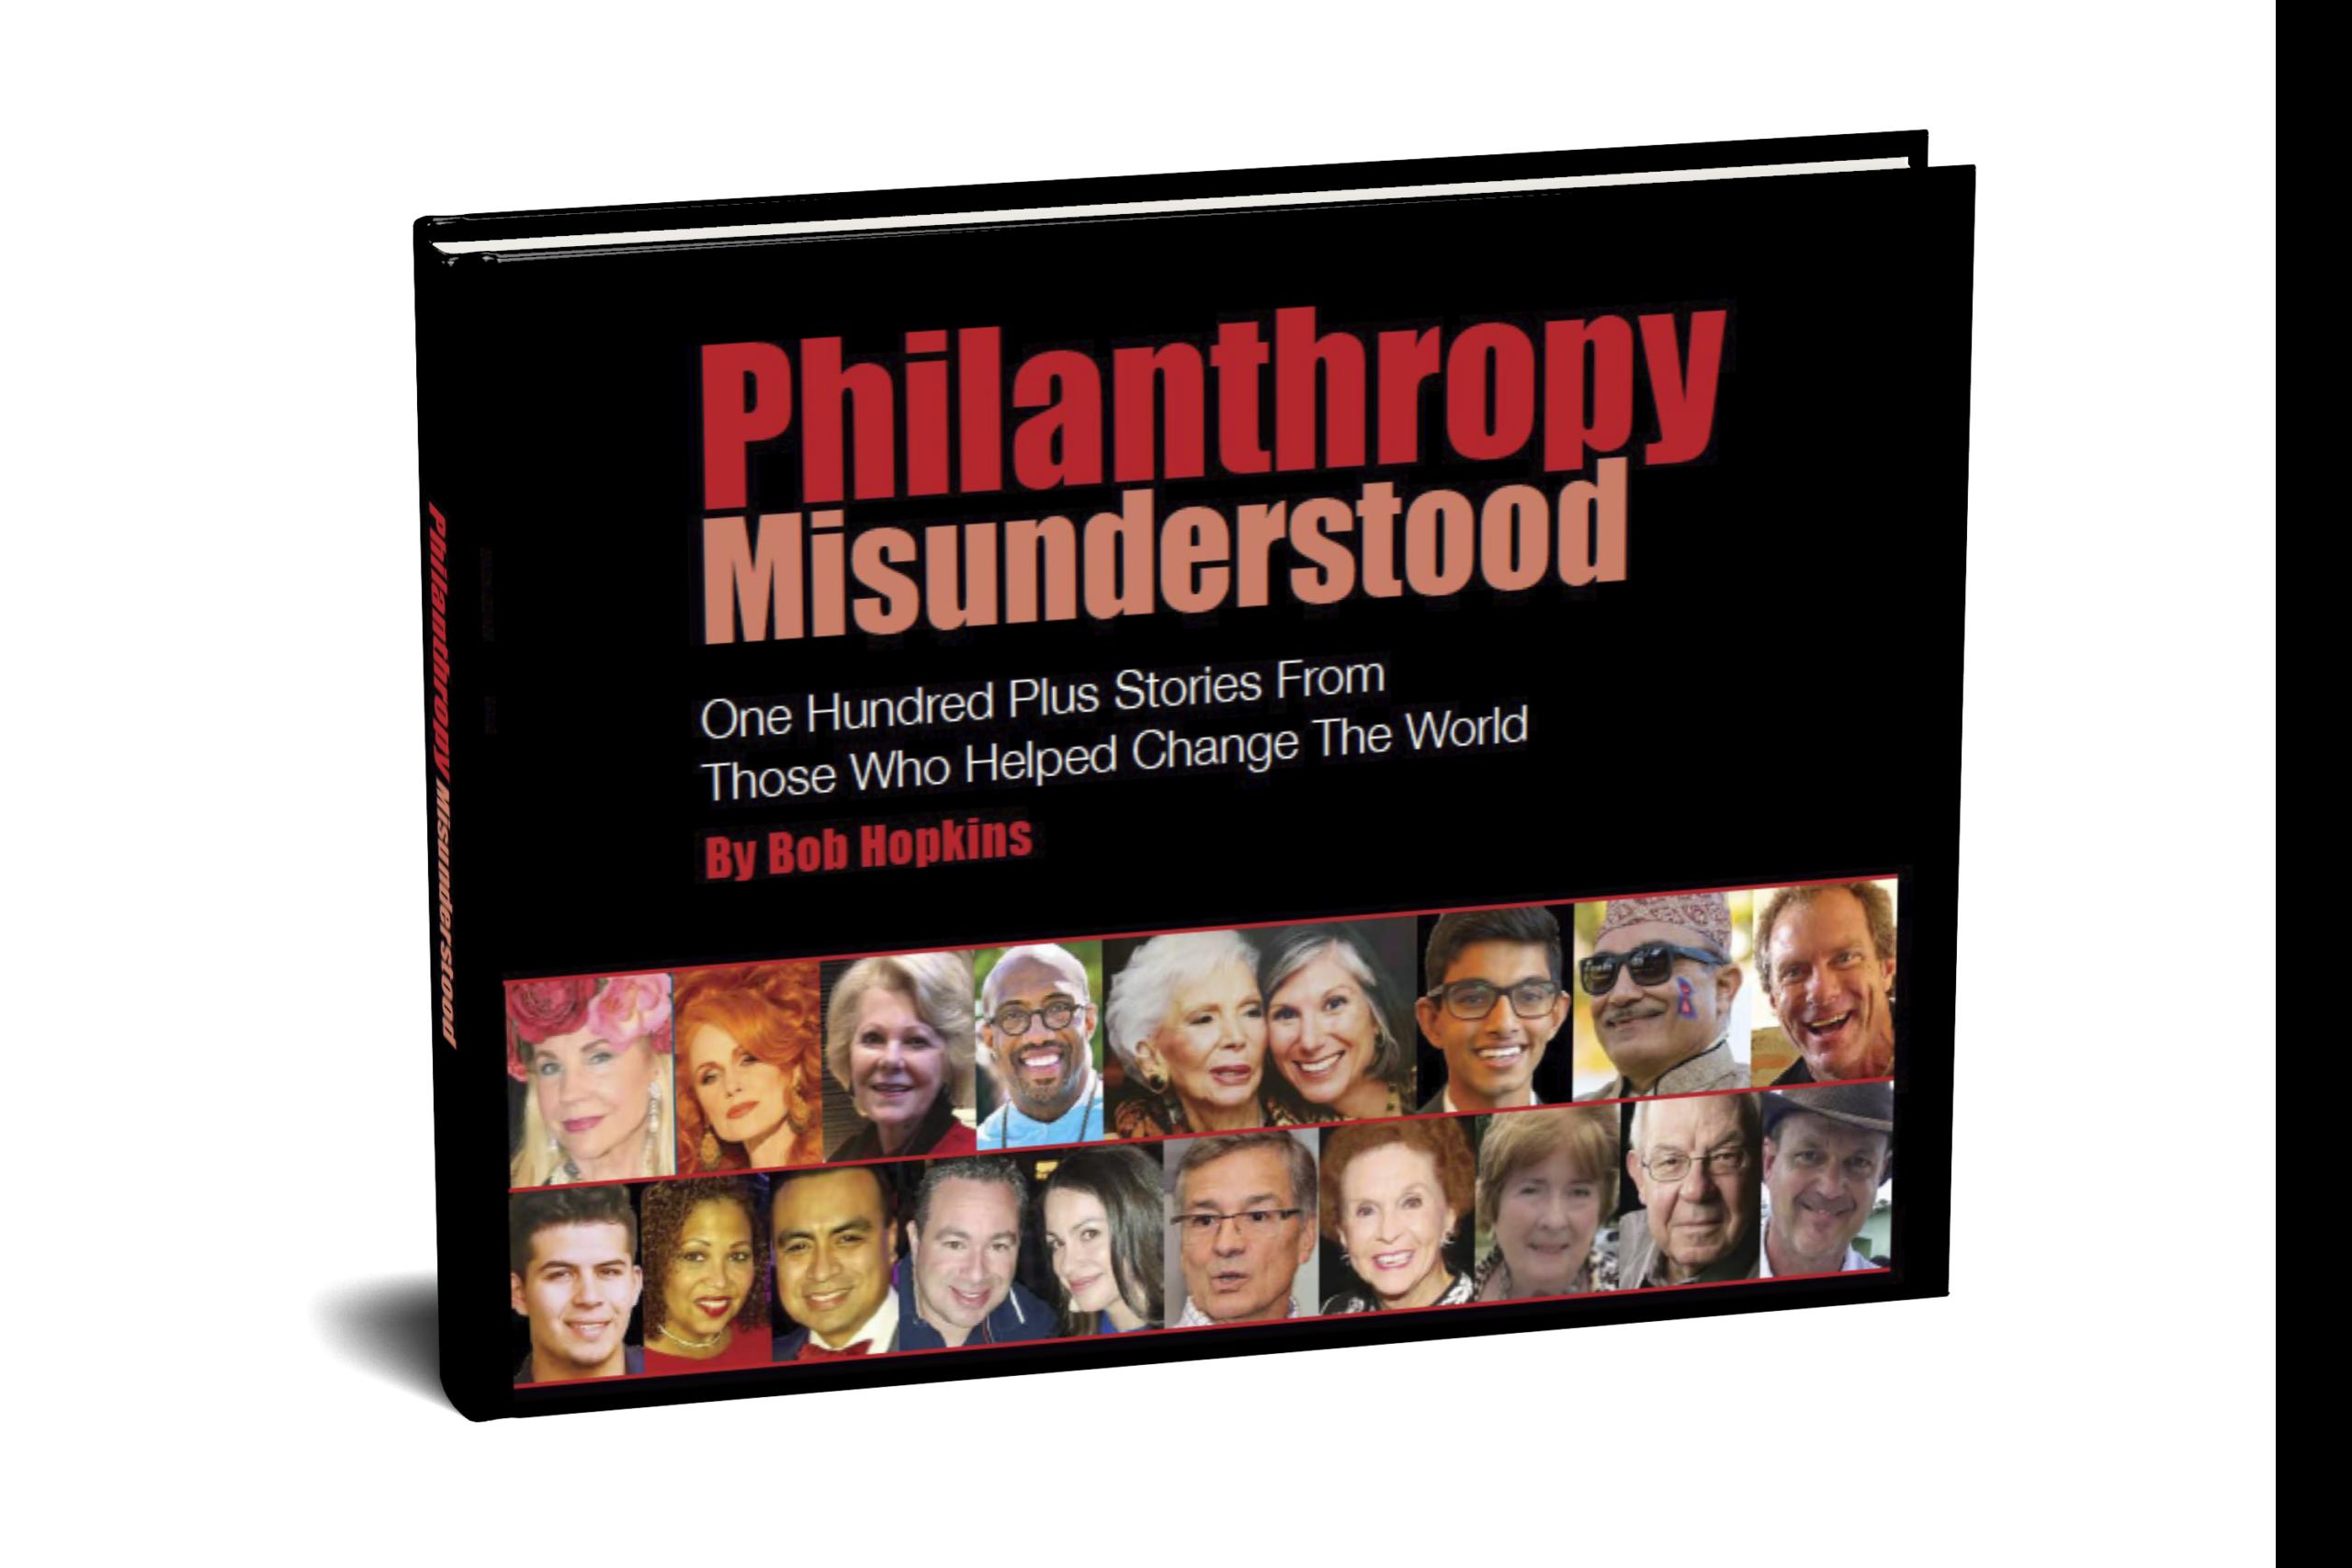 Philanthropy Misunderstood Hardcover